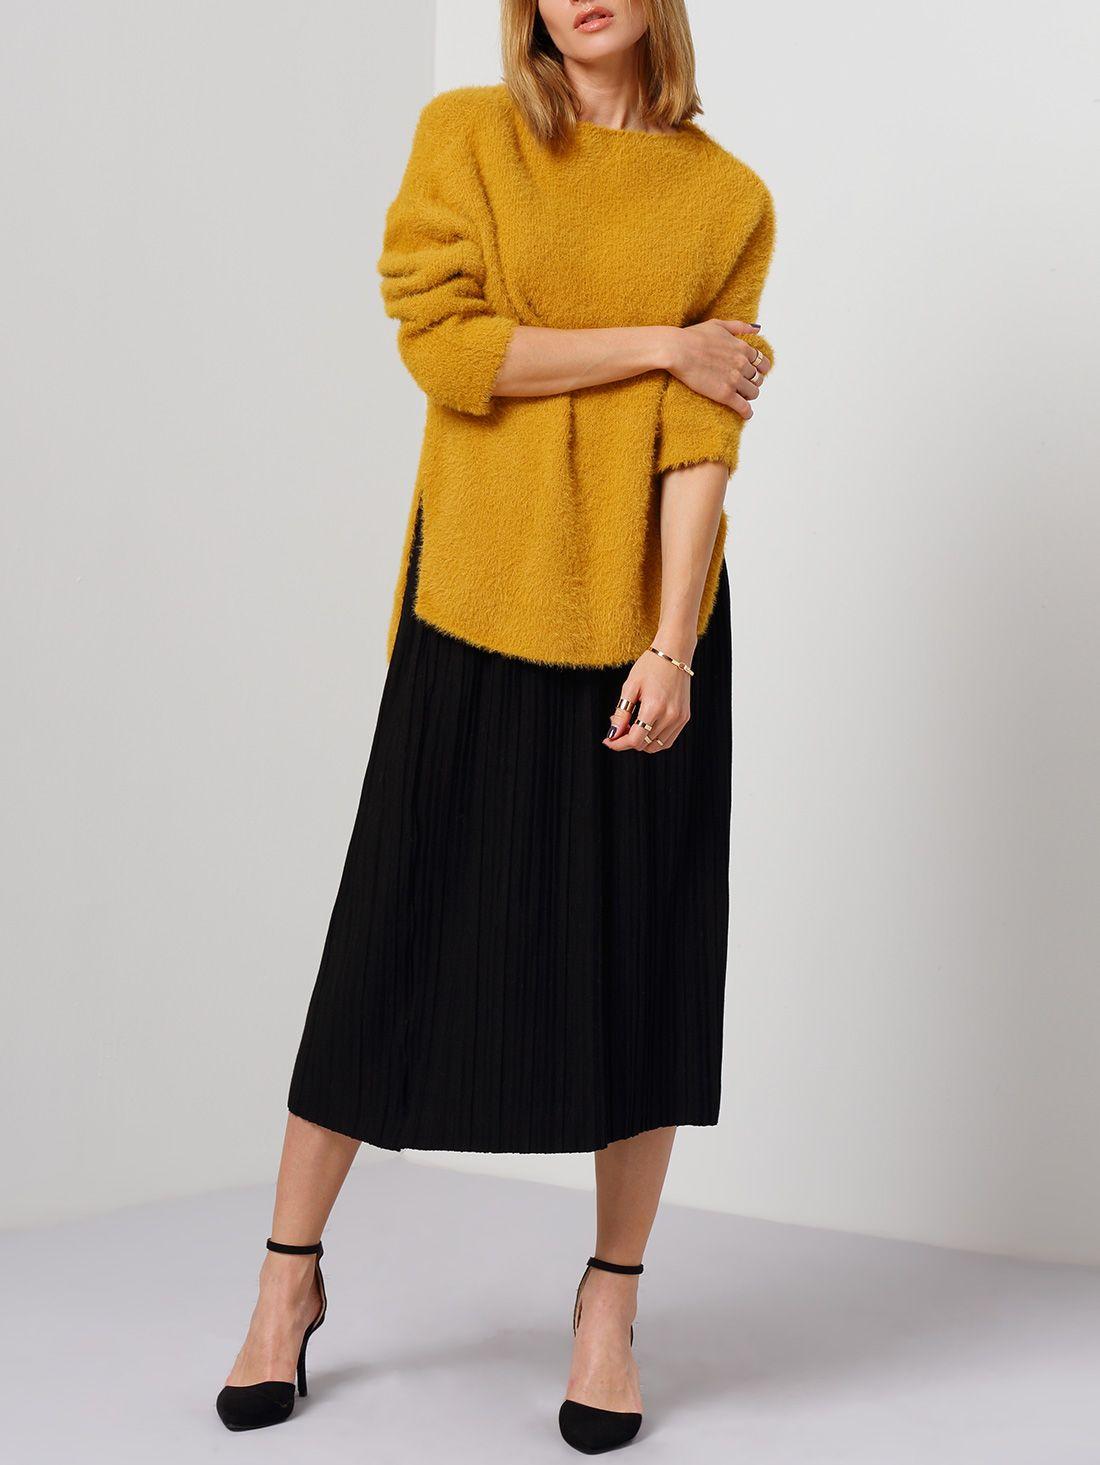 Black elastic waist pleated skirt elastic waist black and shopping